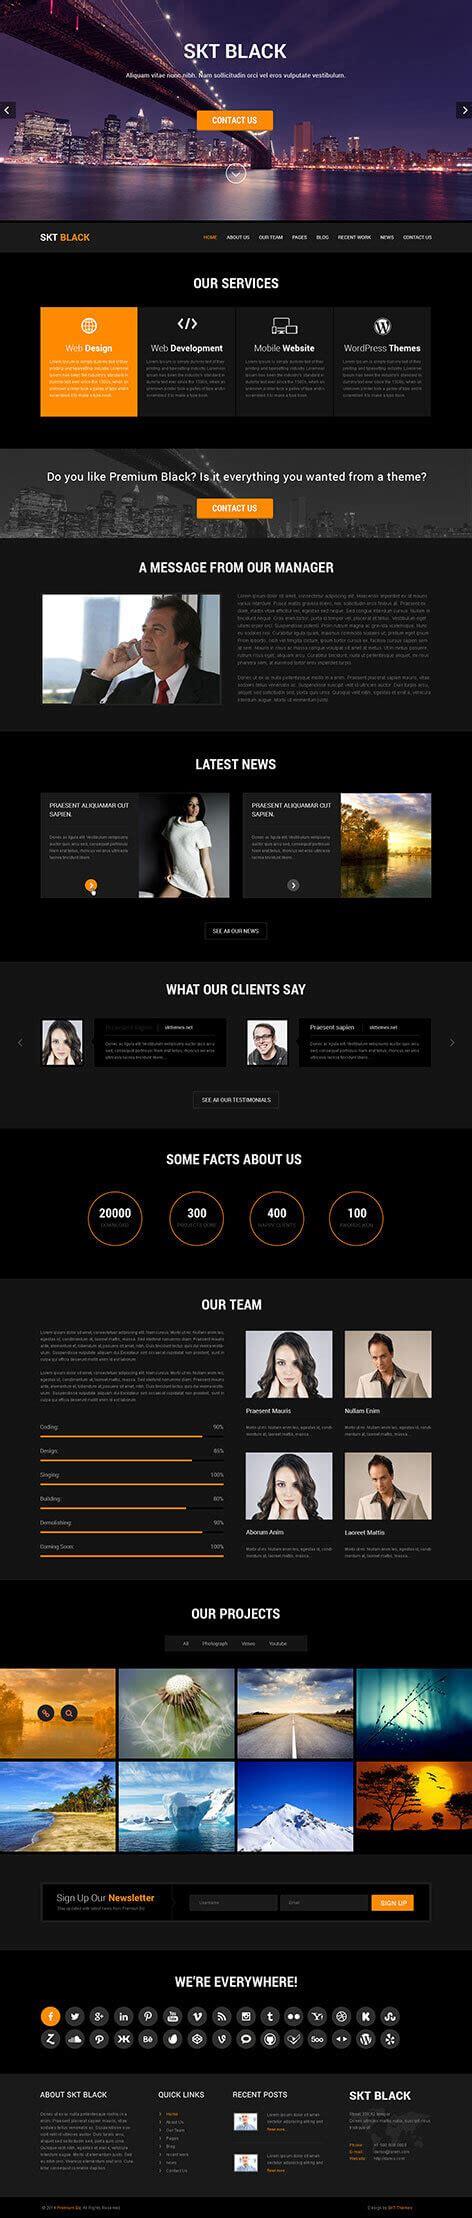 black themed websites dark and black wordpress theme for darker website usage